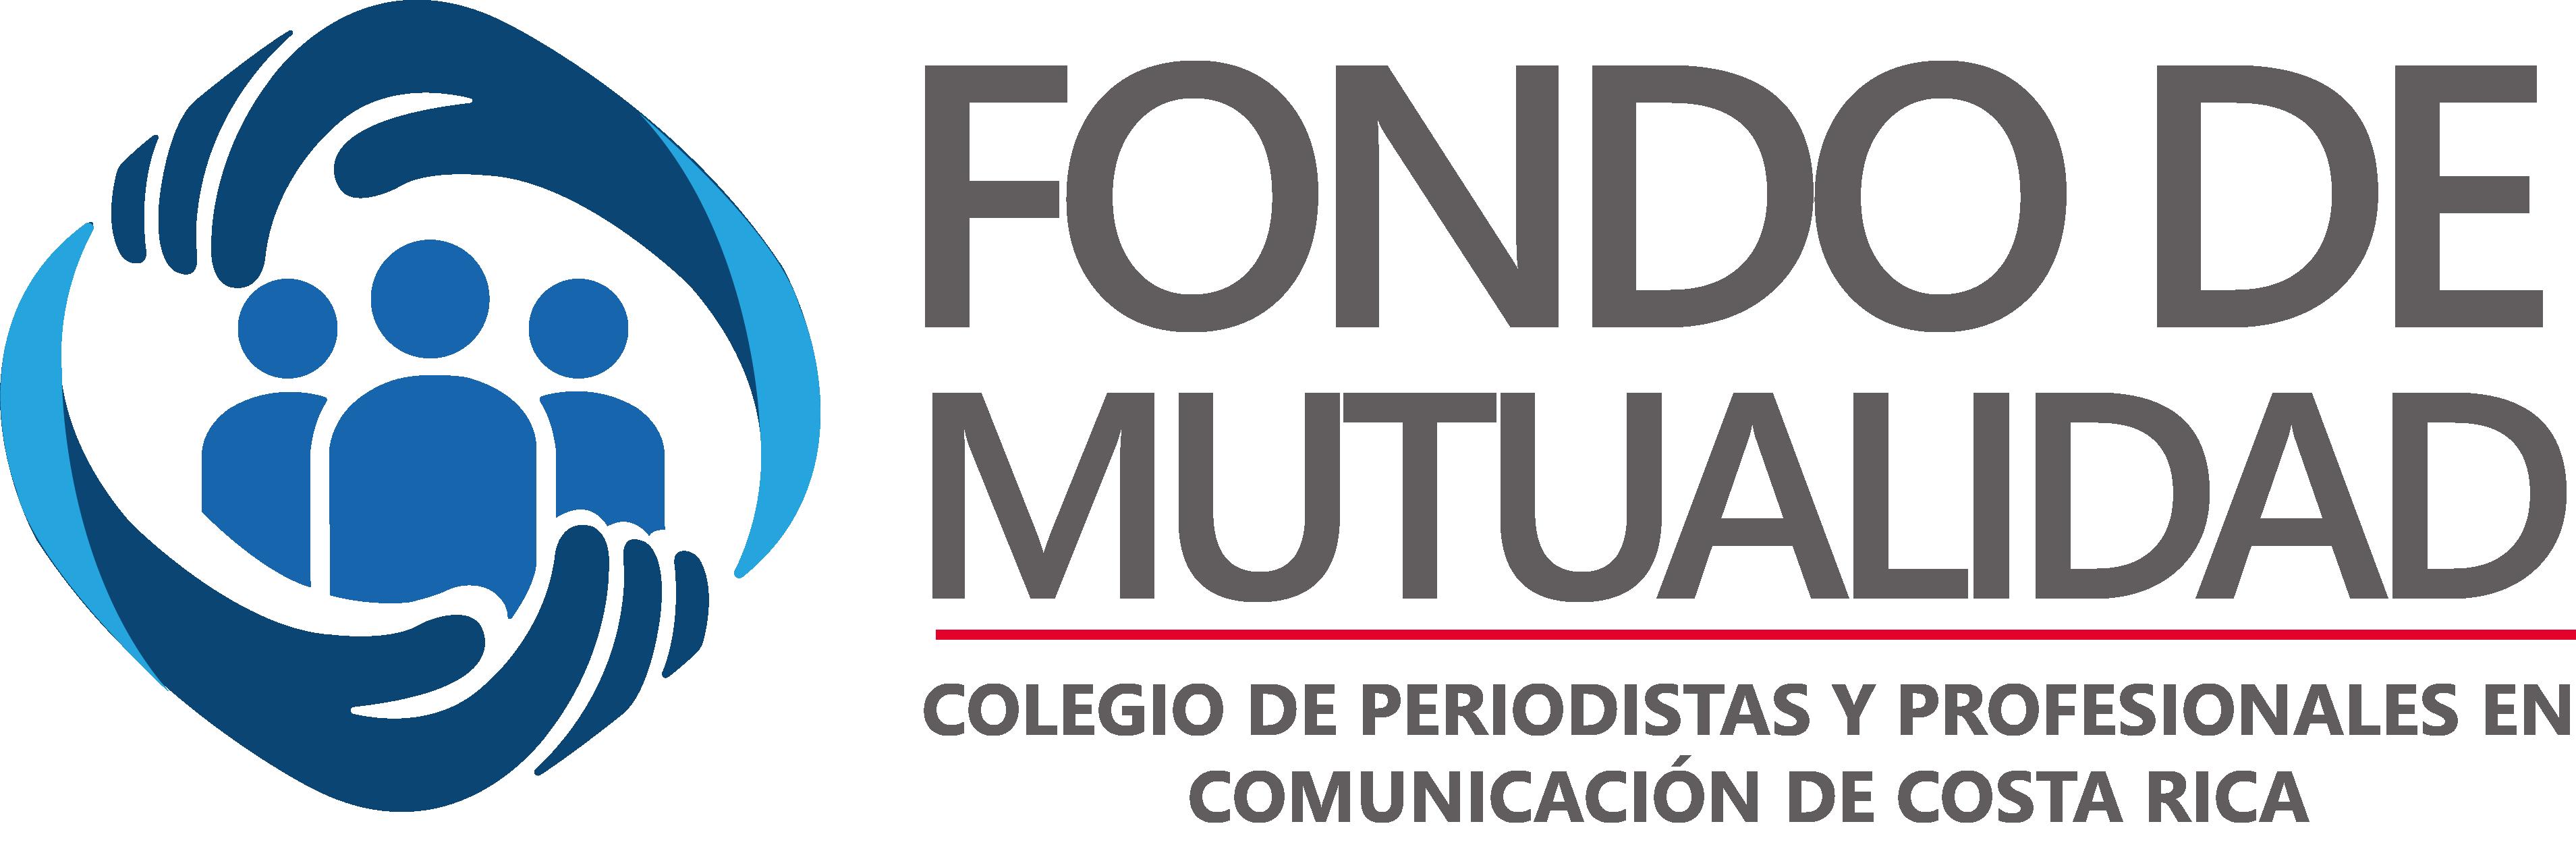 Fondo Mutualidad